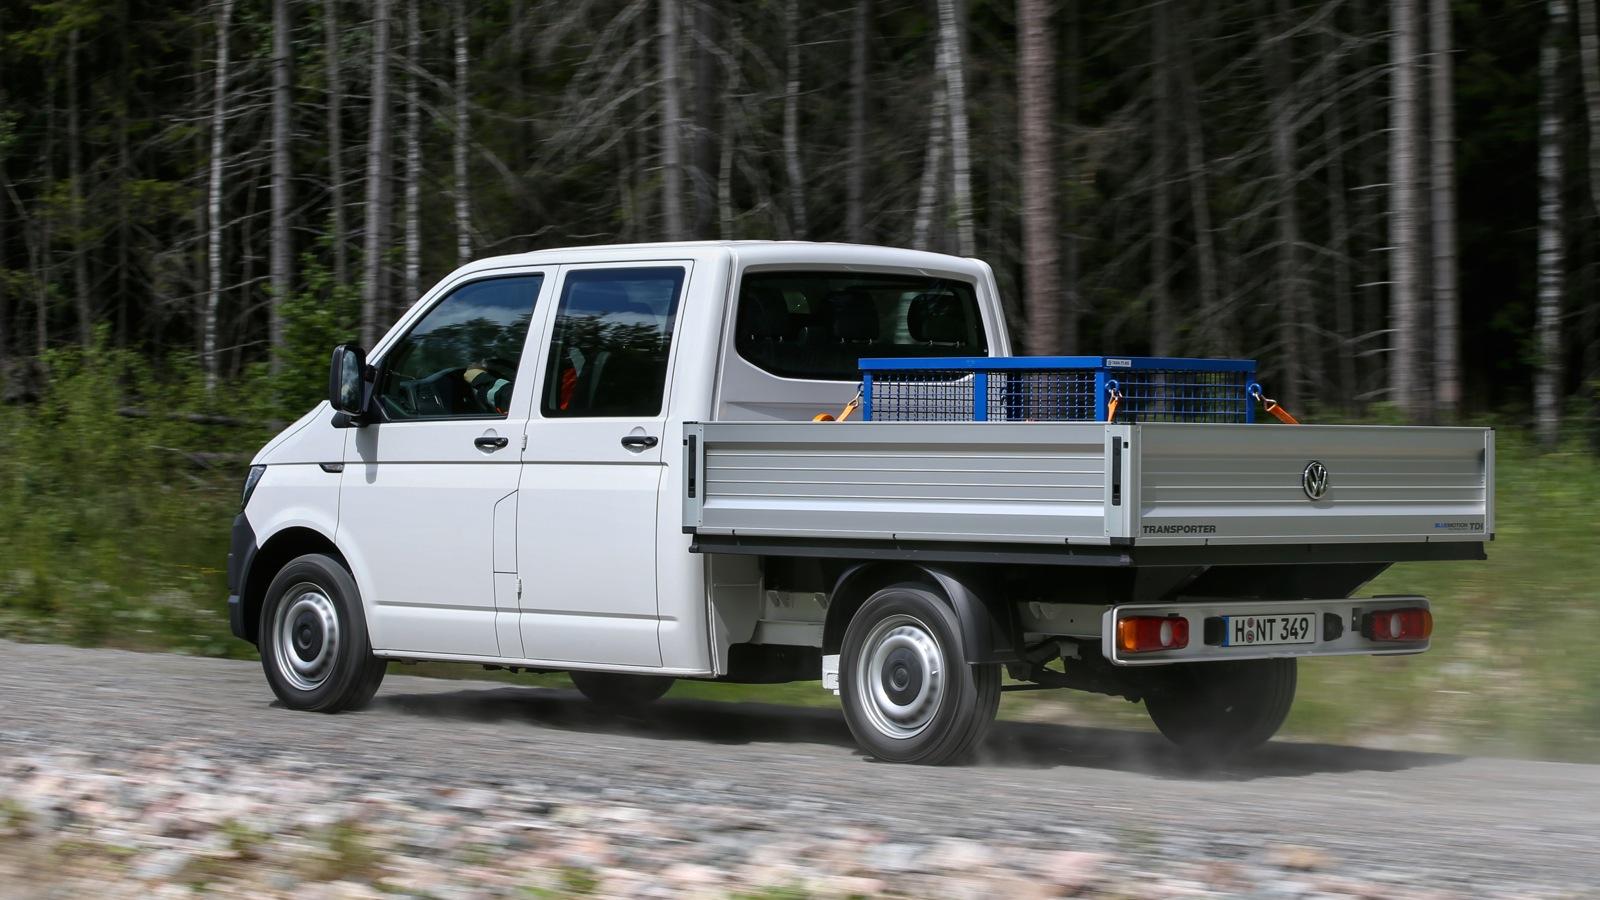 volkswagen transporter t6 review photos caradvice. Black Bedroom Furniture Sets. Home Design Ideas